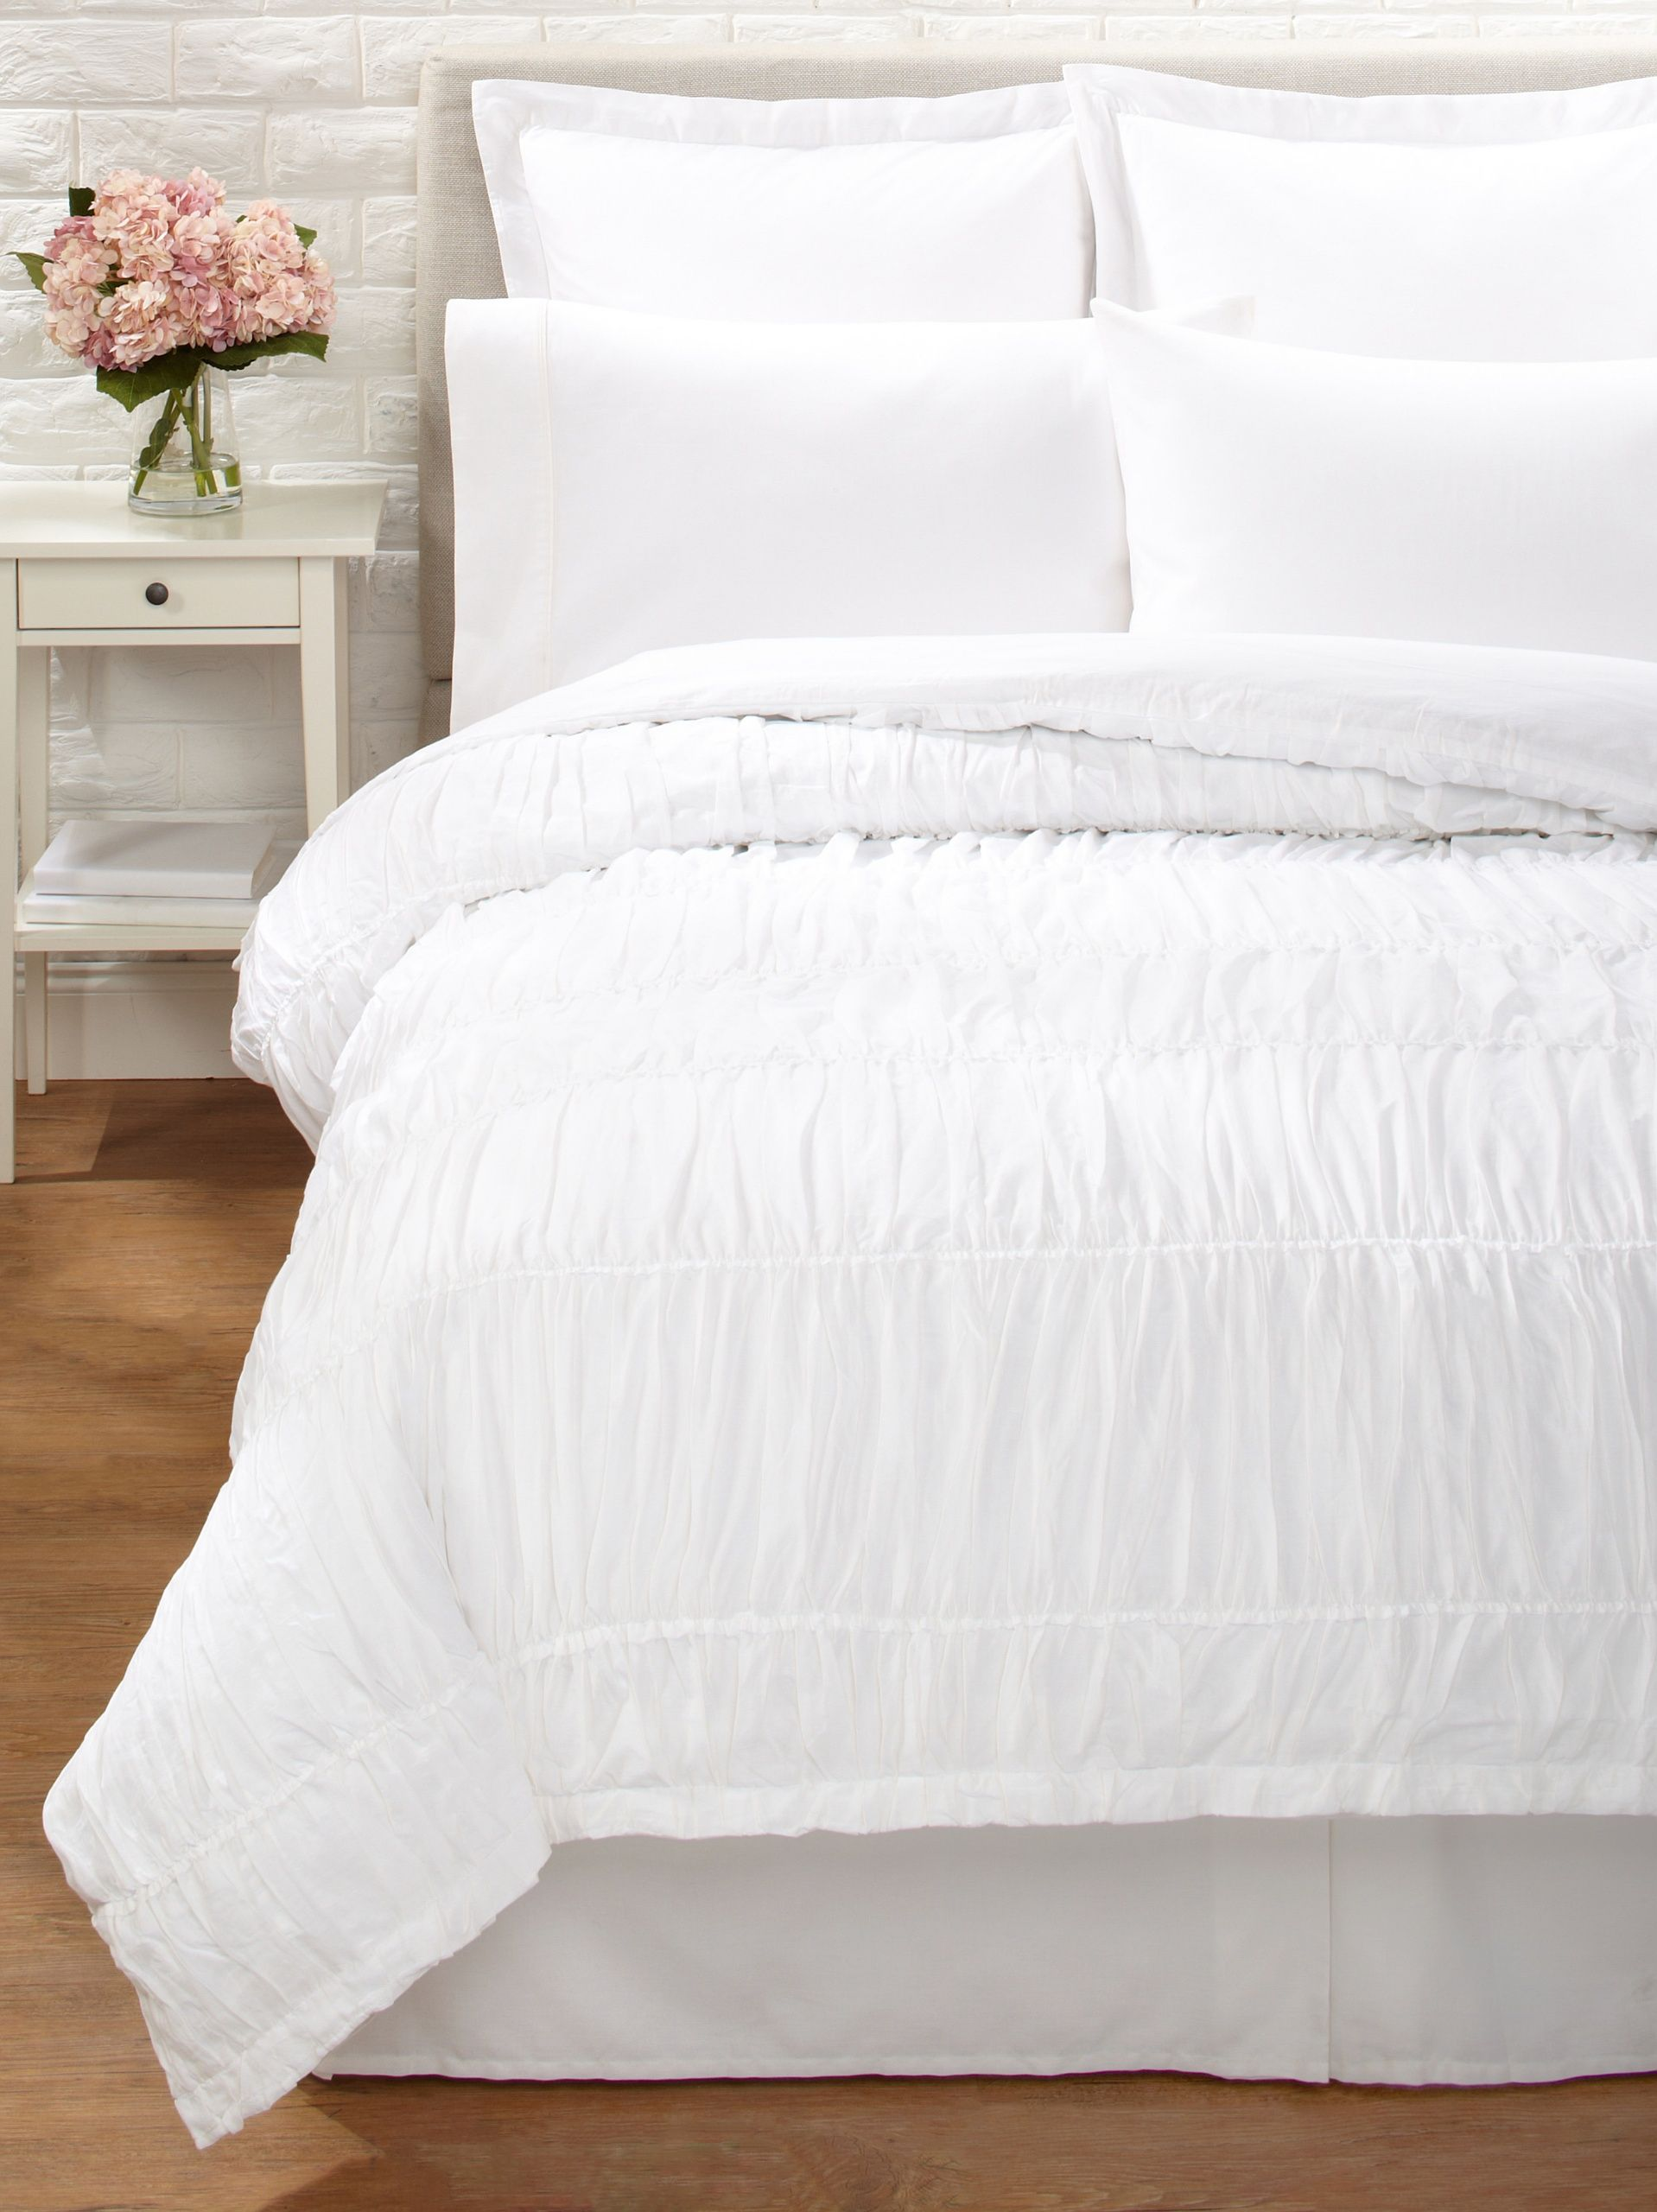 Amity Home Reann Duvet Cover (Charcoal) Lightweight Cotton Duvet Cover